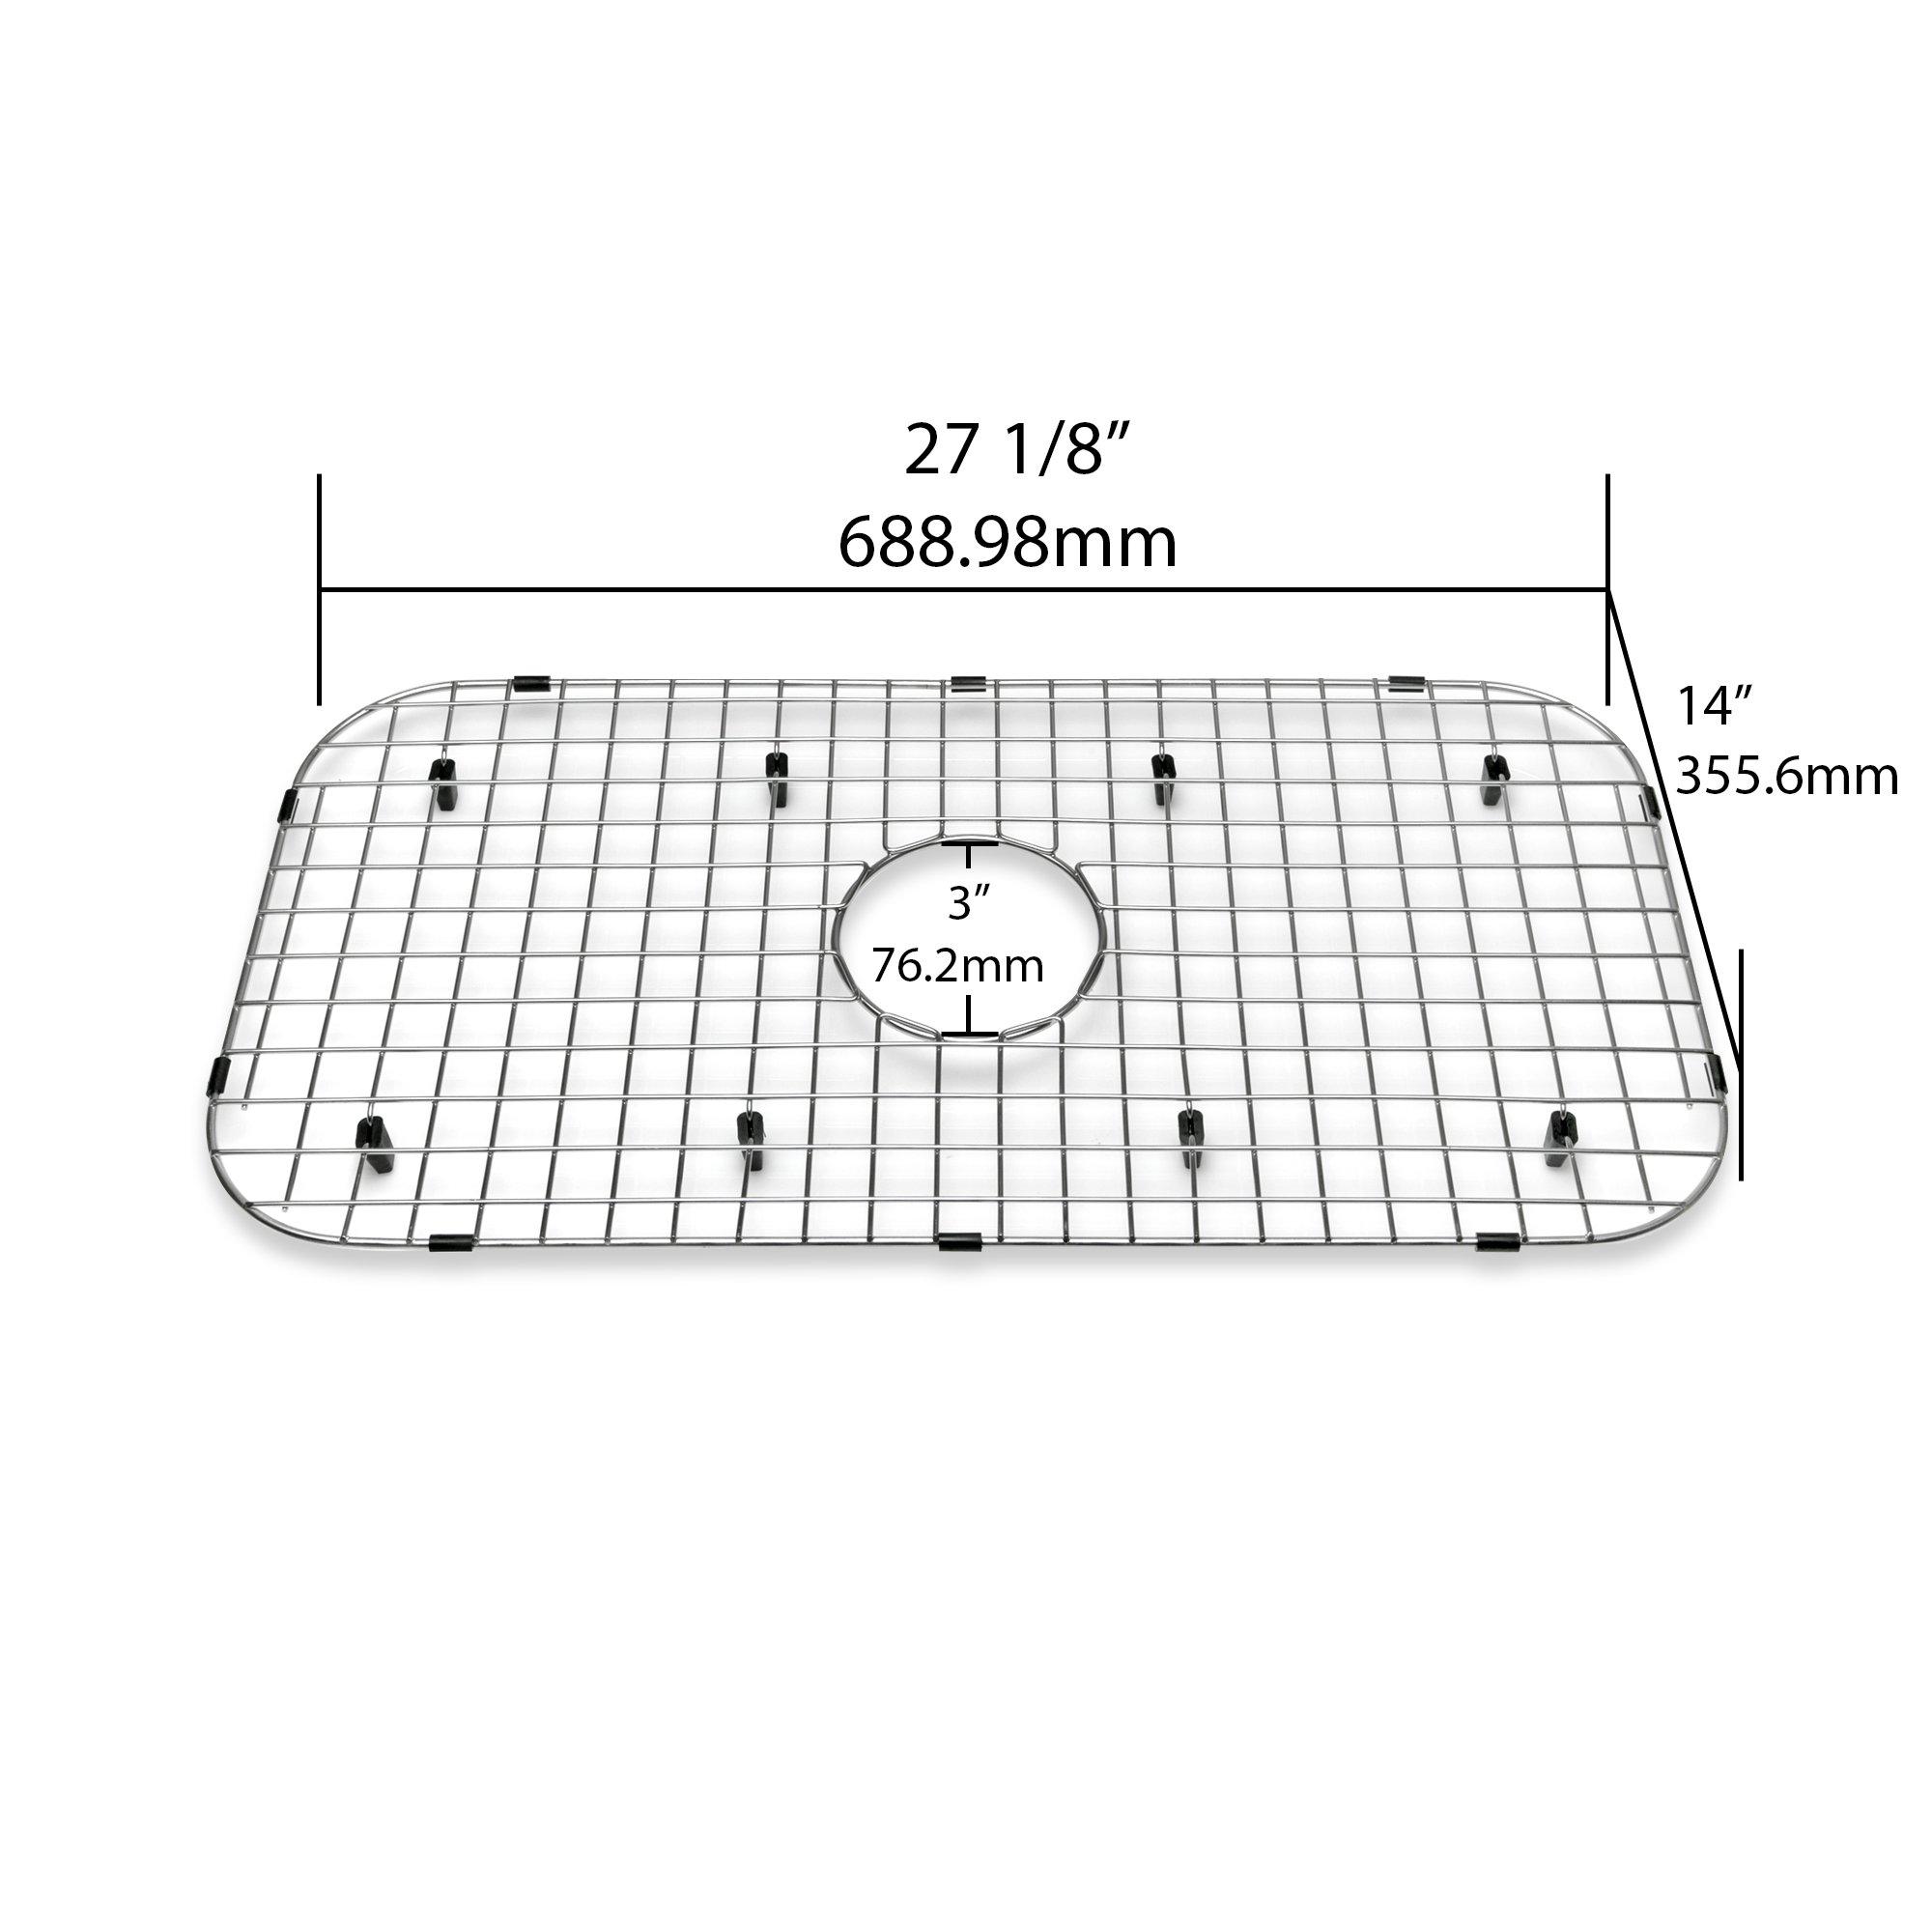 "Decor Star KBG-P05 Kitchen Sink Bottom Grid, Stainless Steel, 27 1/8"" x 14"""